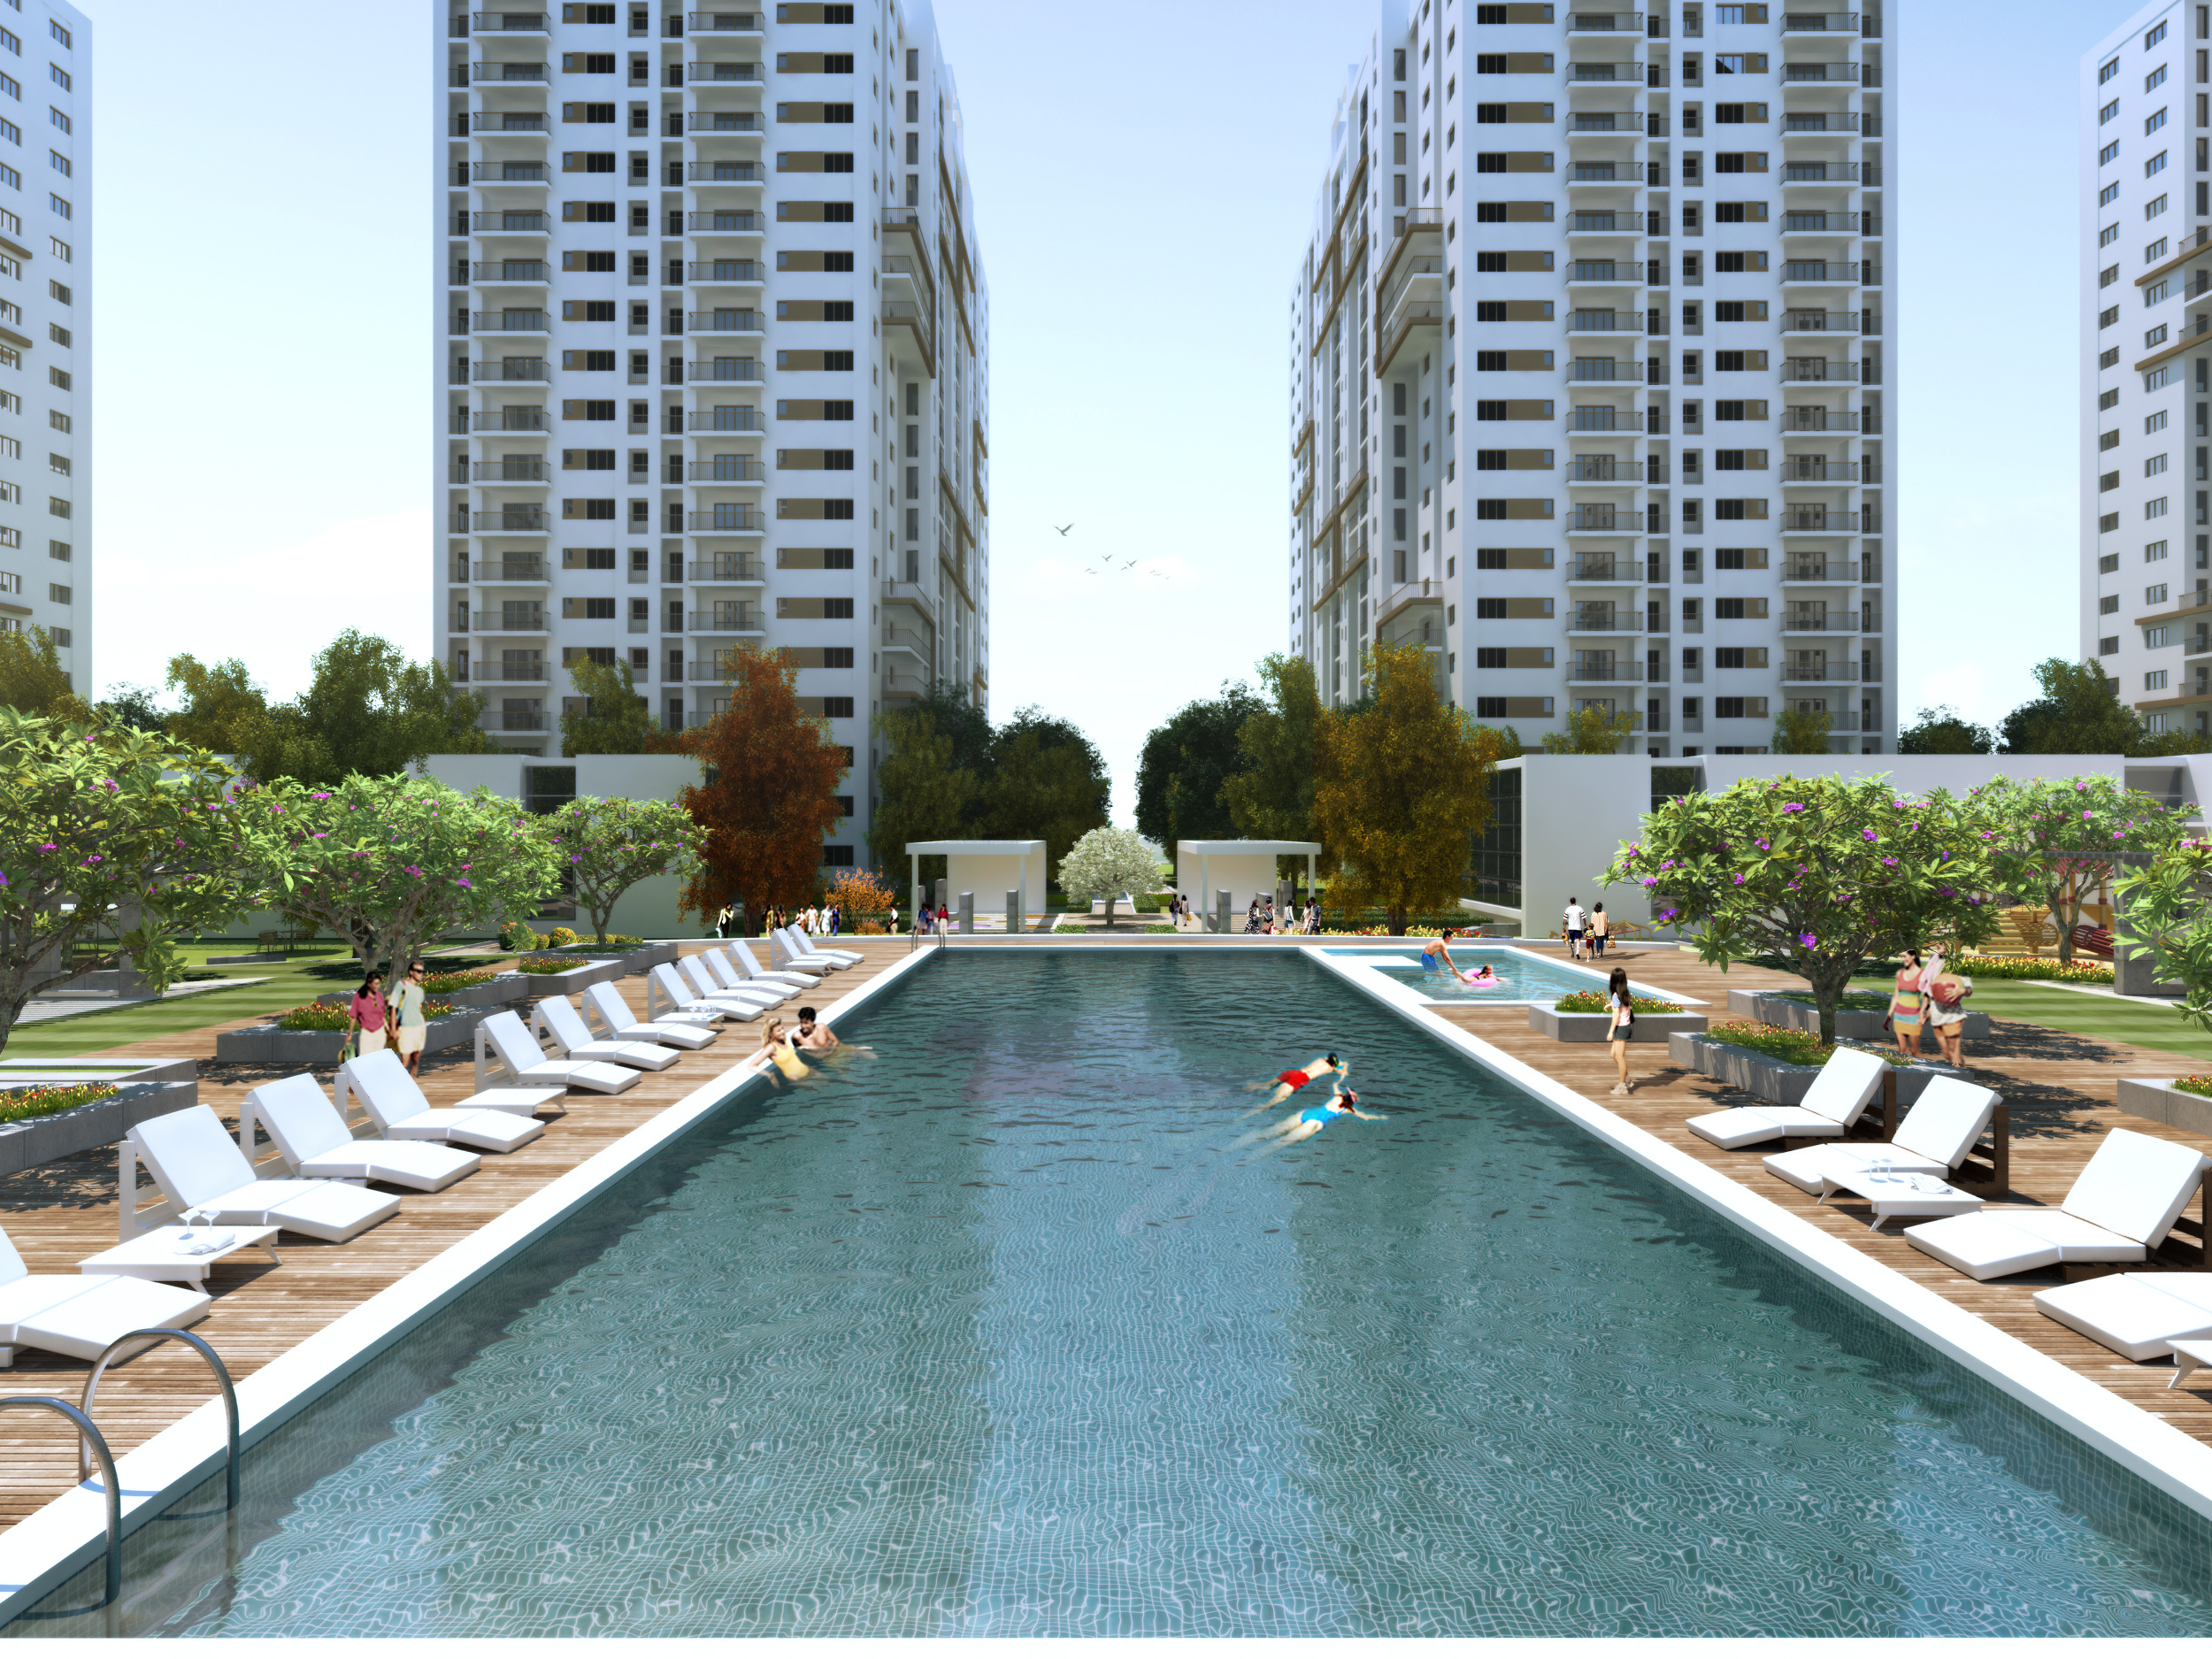 1150 Sq Ft 2 Bhk 2t Apartment For Sale In Pbel Aurum Appa Junction Peerancheru Hyderabad